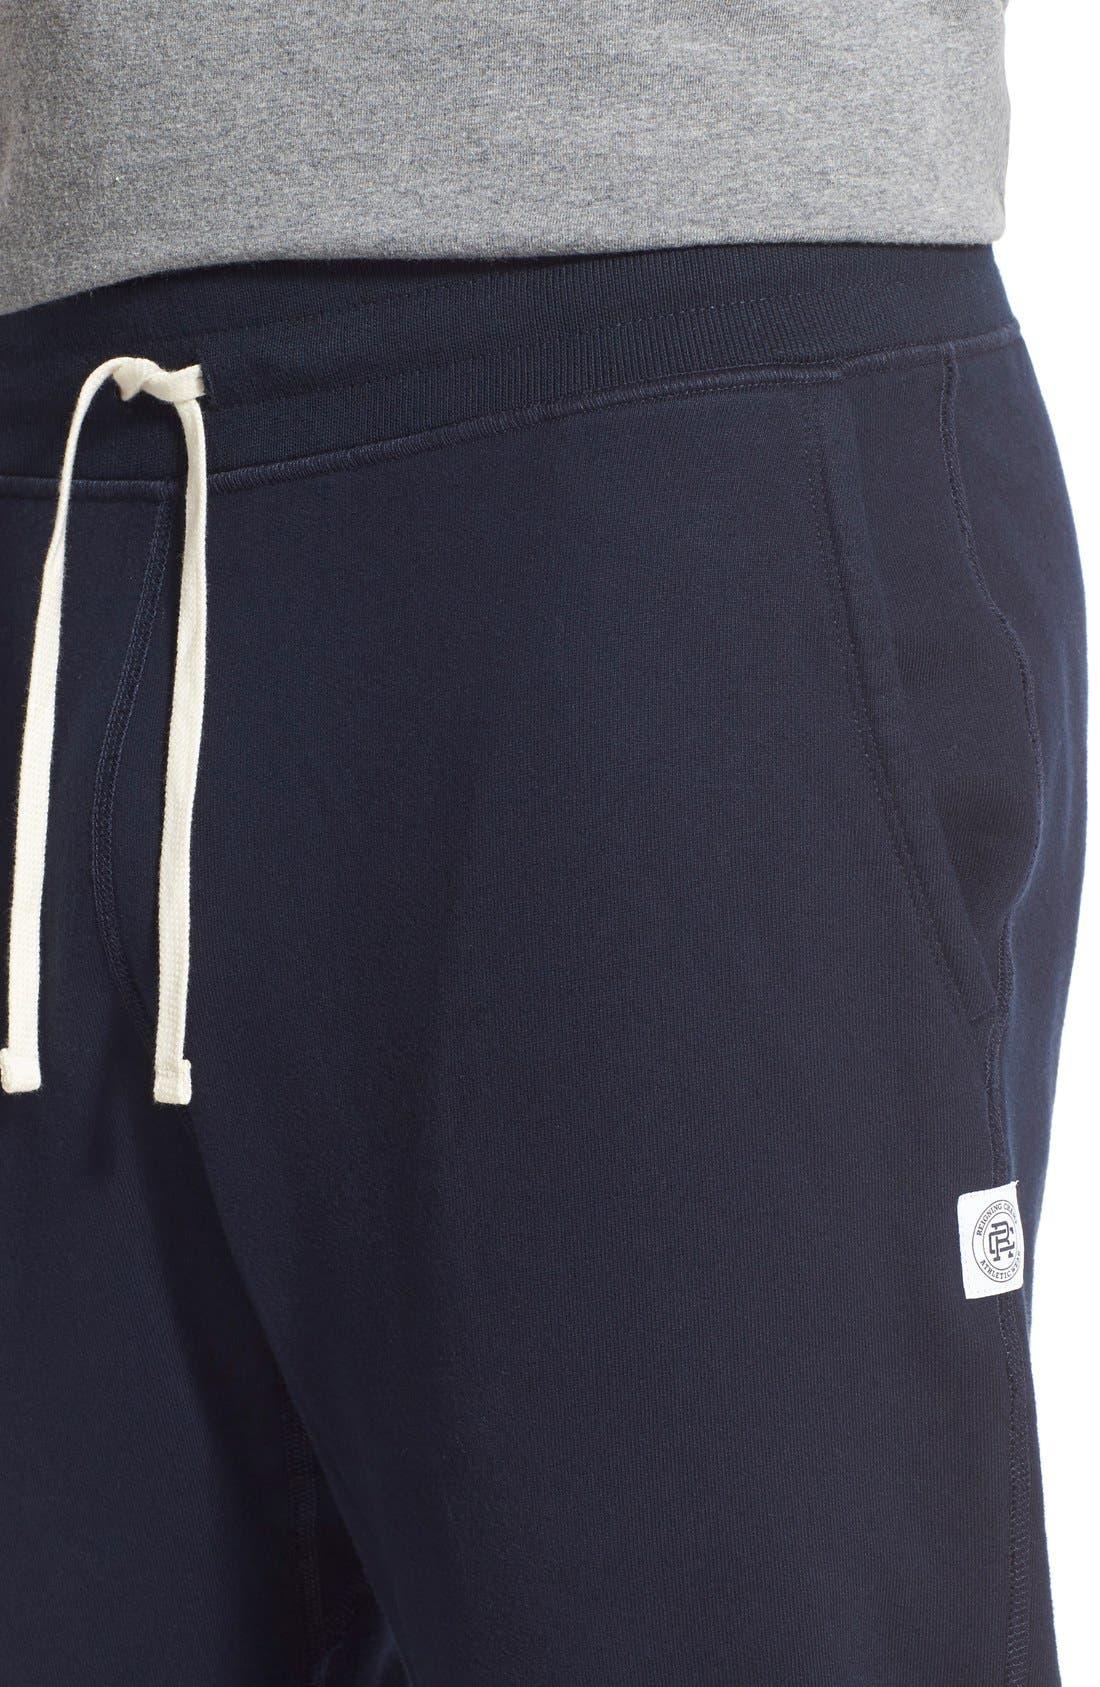 Slim Fit Sweatpants,                             Alternate thumbnail 20, color,